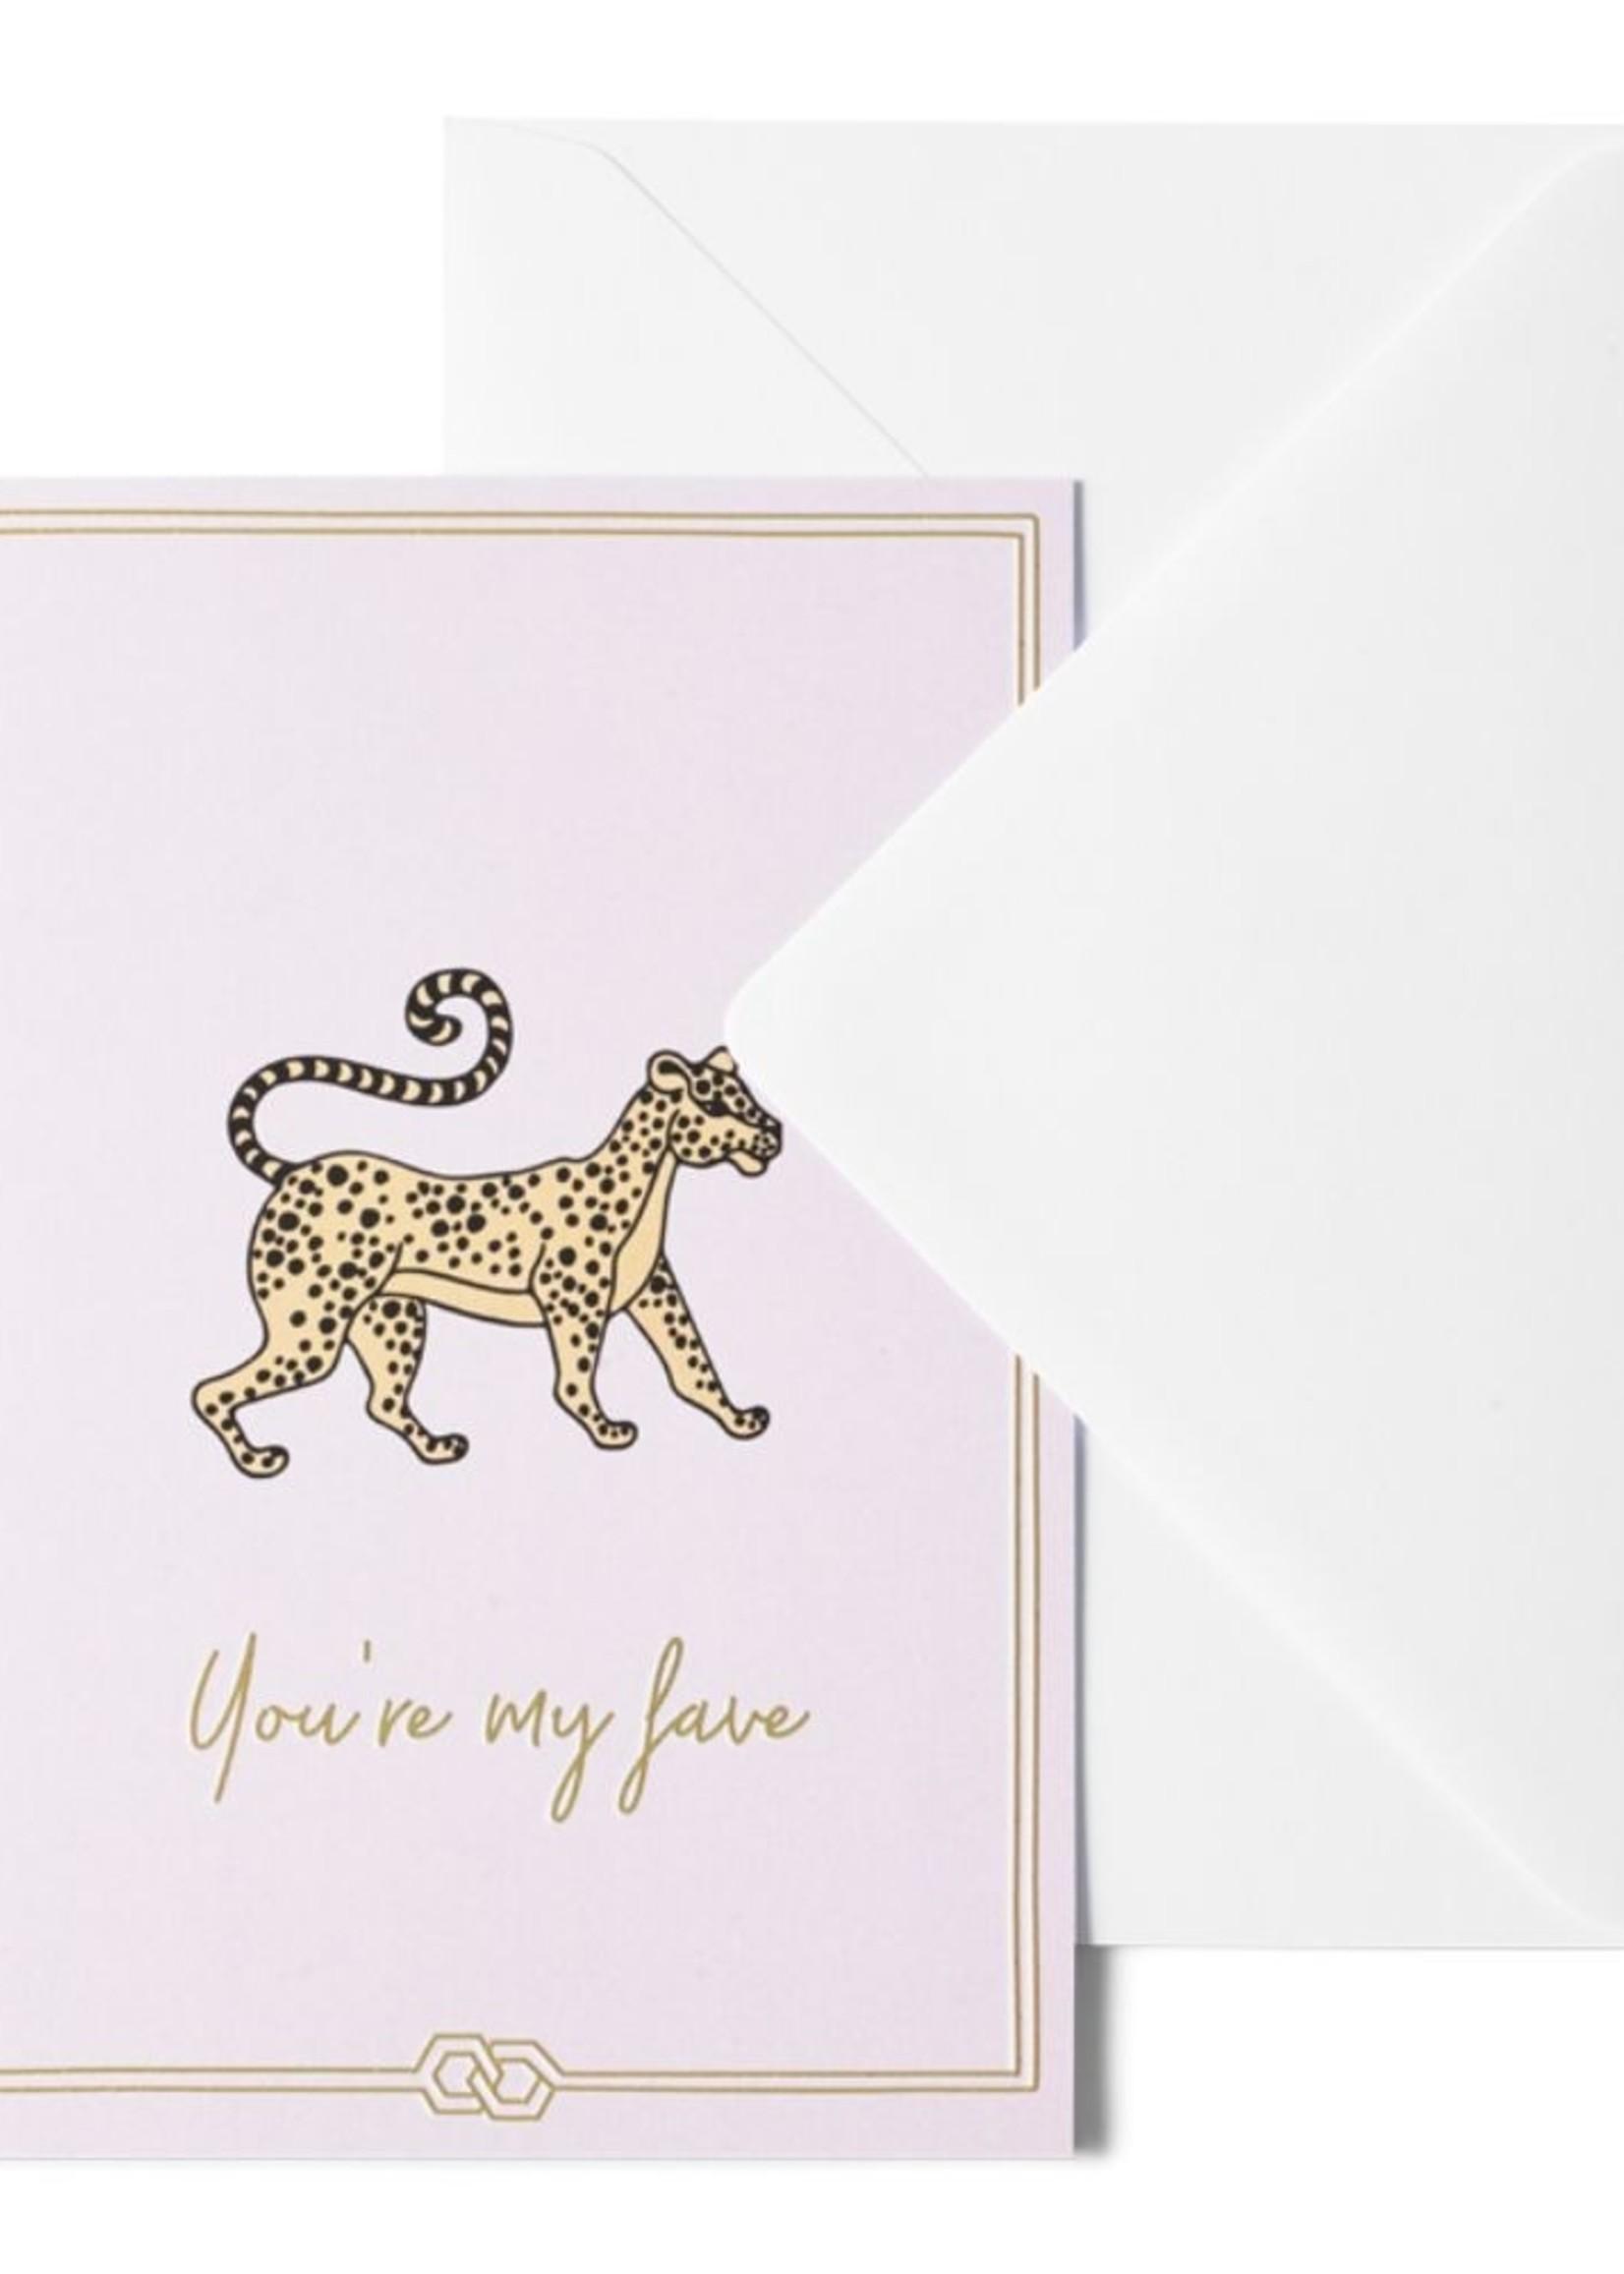 Me & Mats Me & Mats Greeting Card You're My Fave